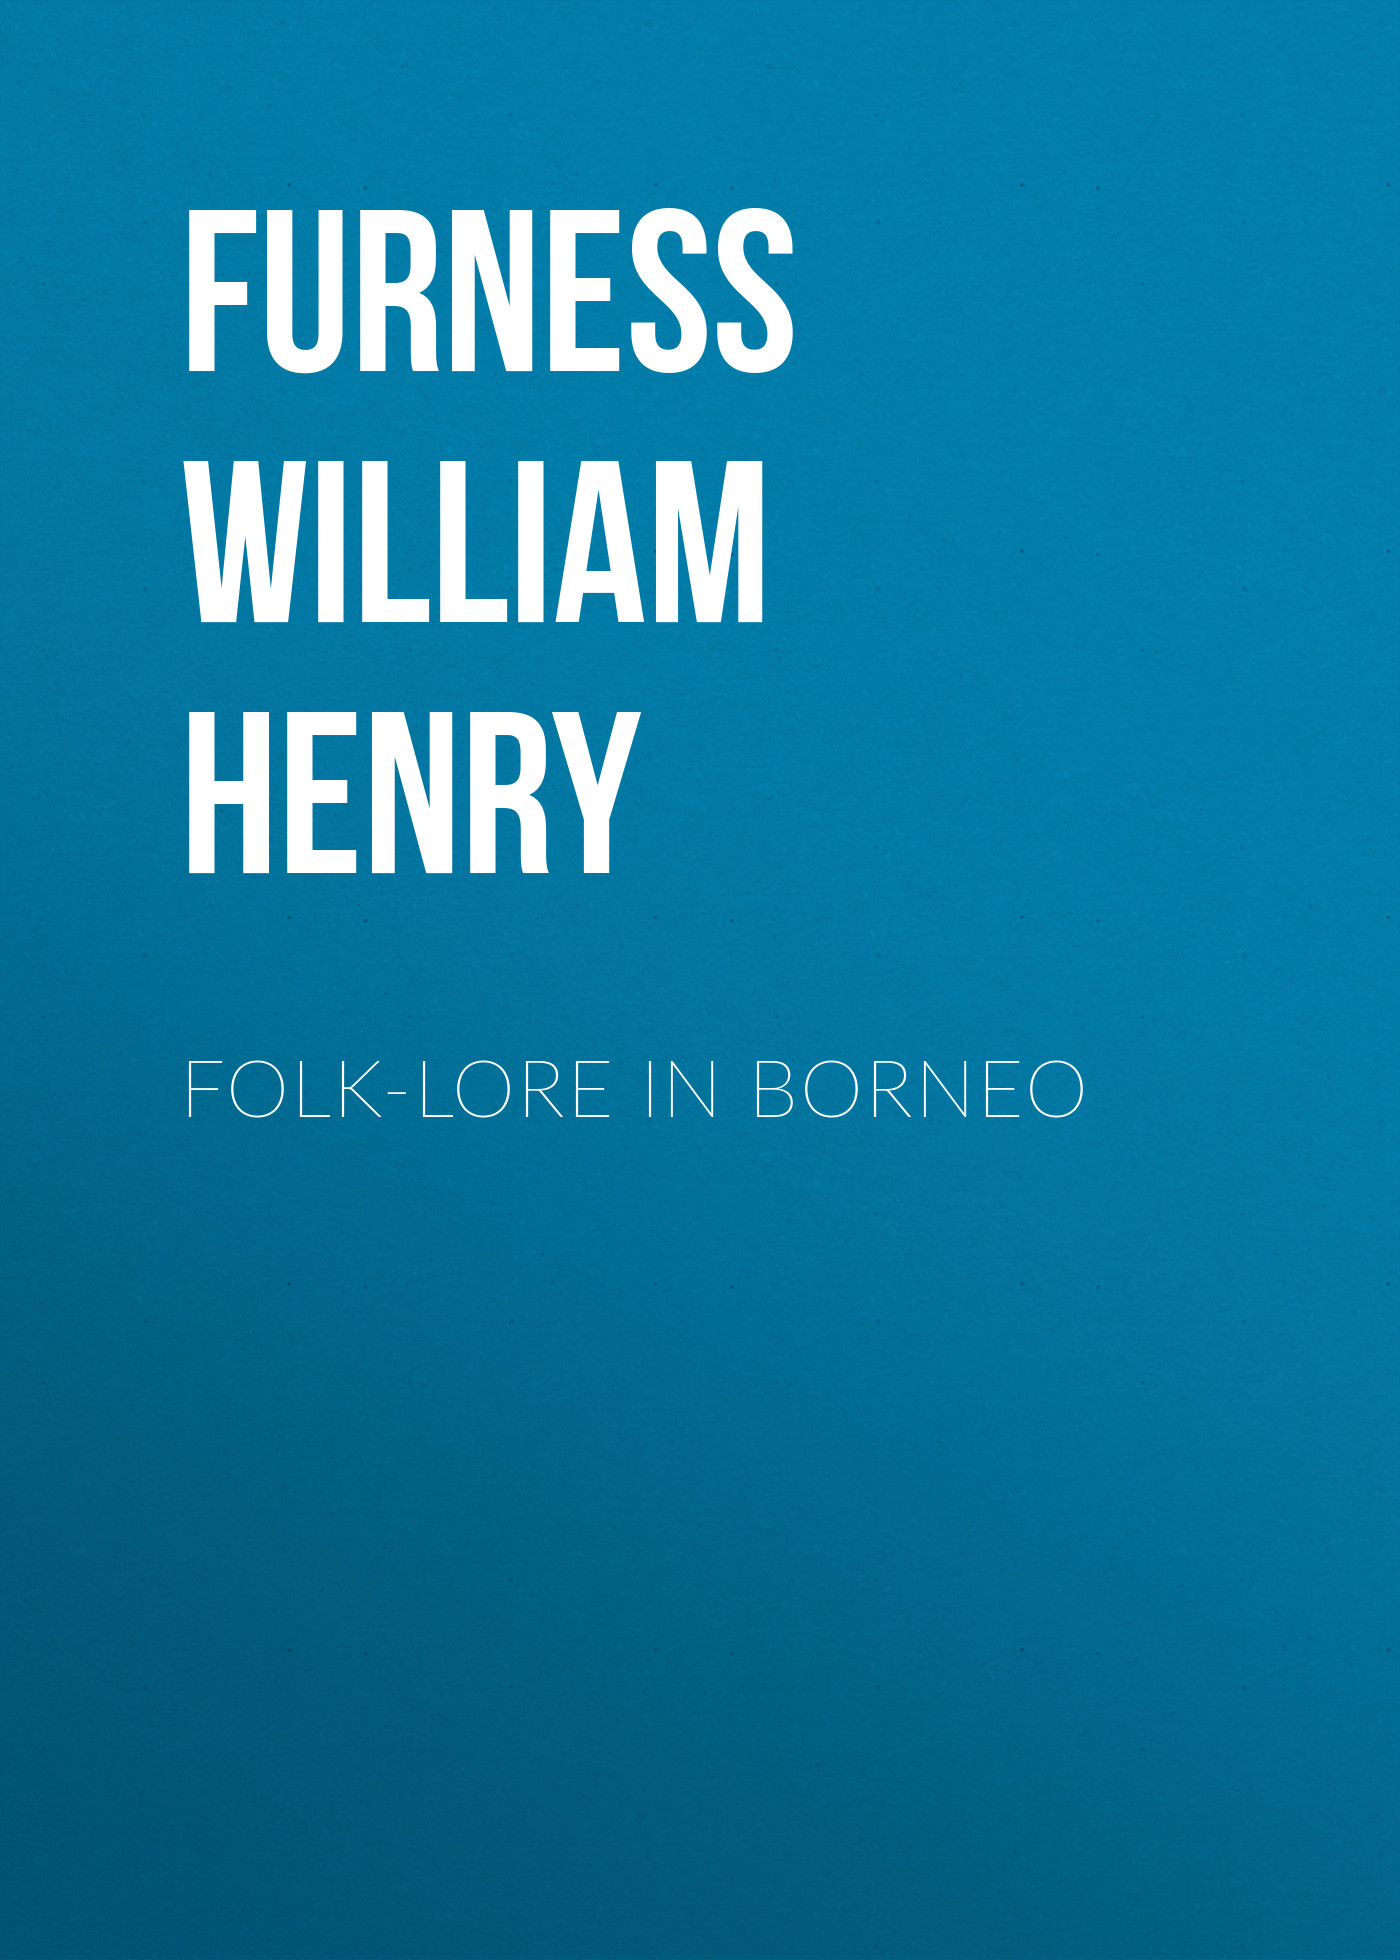 Furness William Henry Folk-lore in Borneo